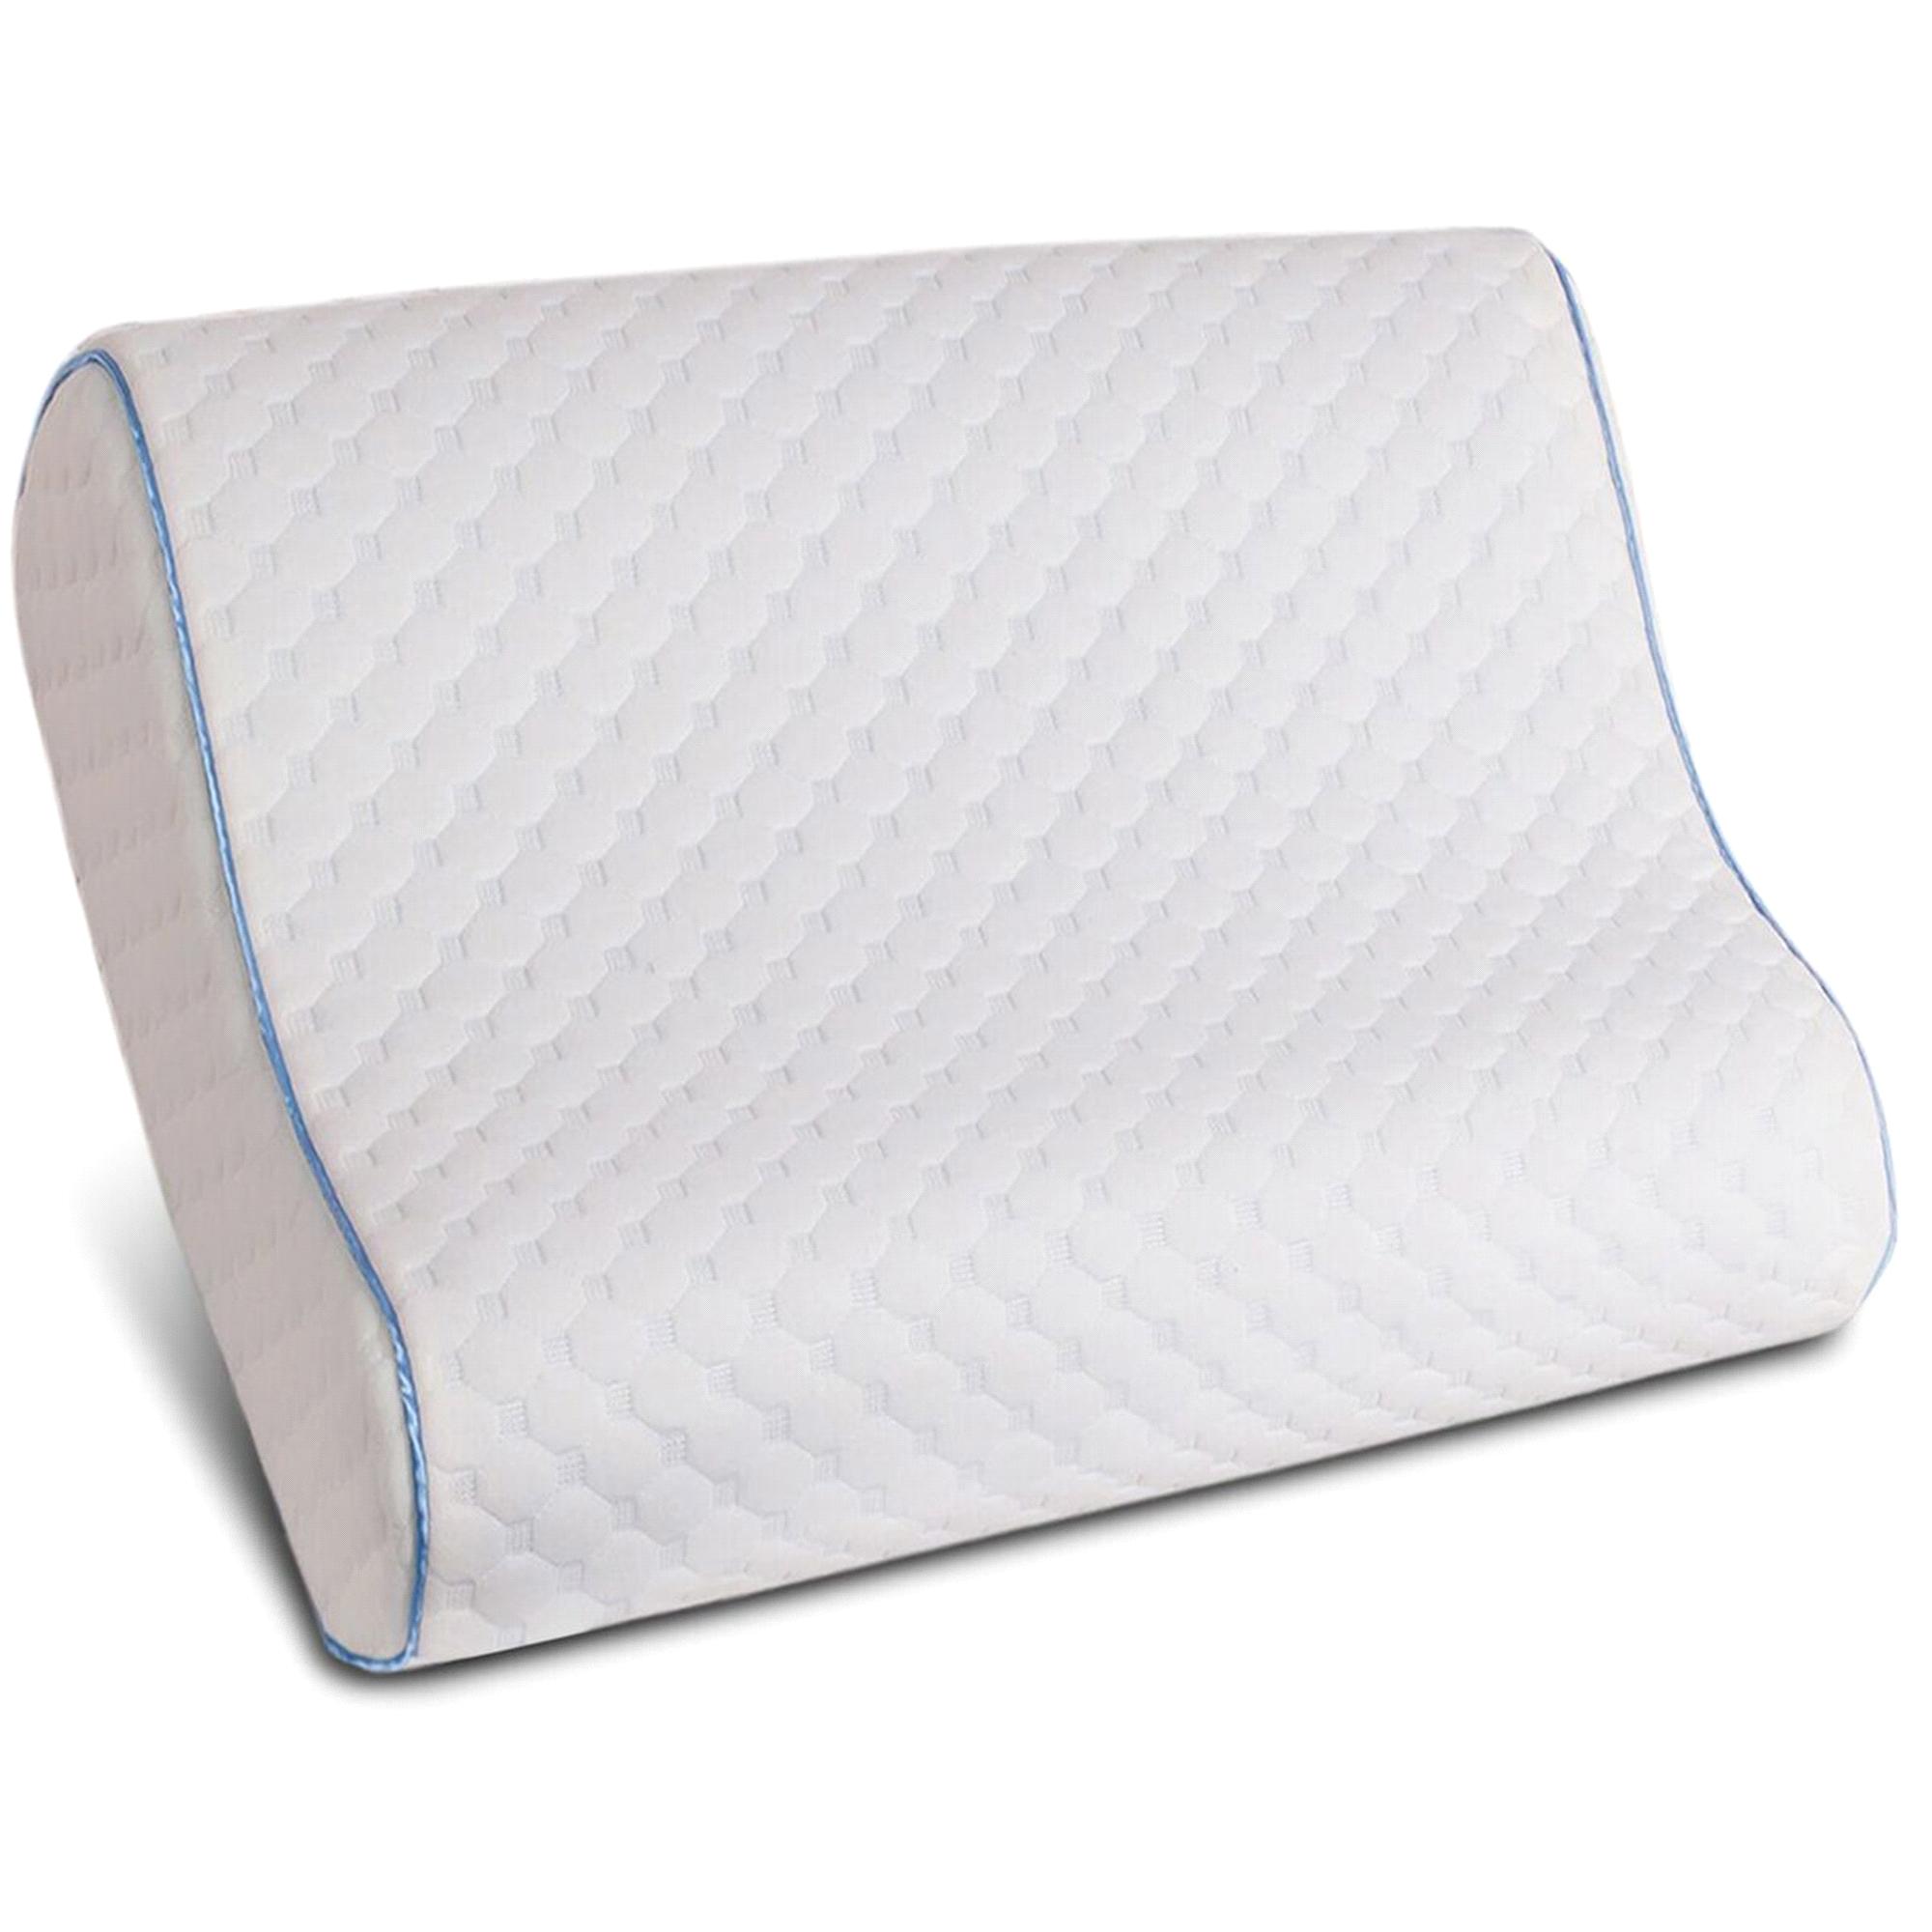 memory product innovations therapeutic pillow sleep contourpillow contour foam pillows